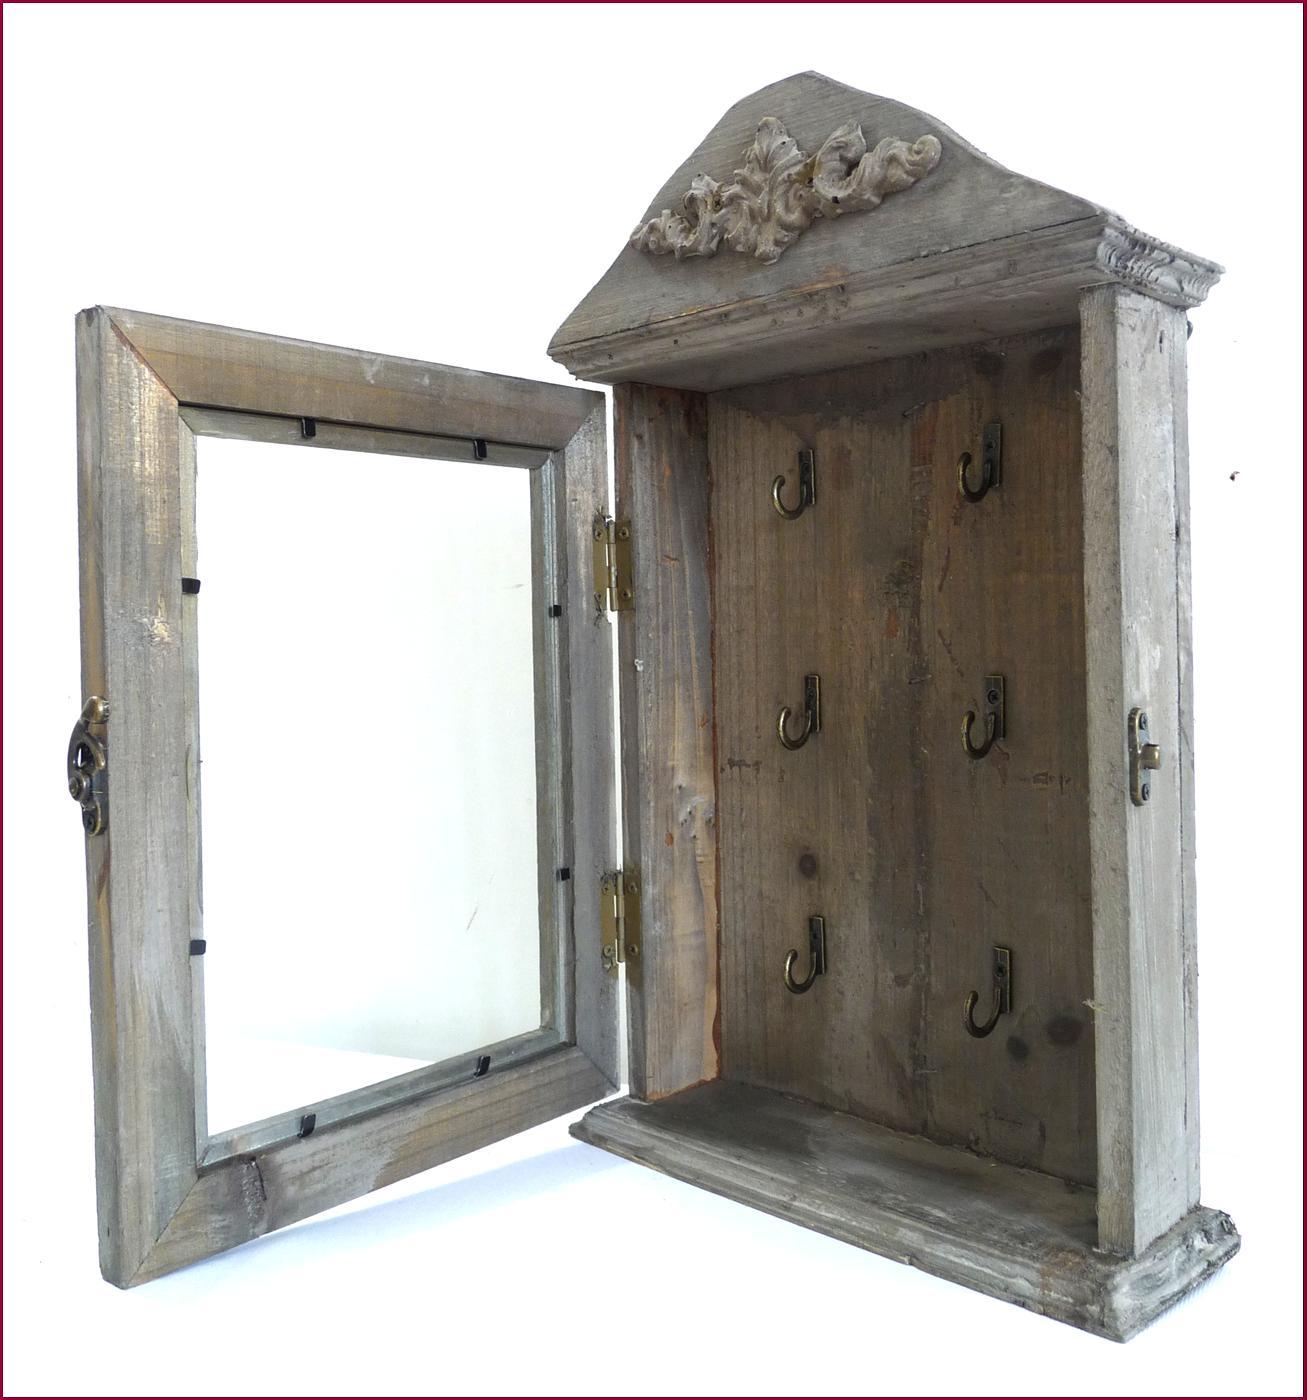 Style ancienne boite coffre armoire de rangement a clef cles en bois murale - Armoire de rangement murale ...